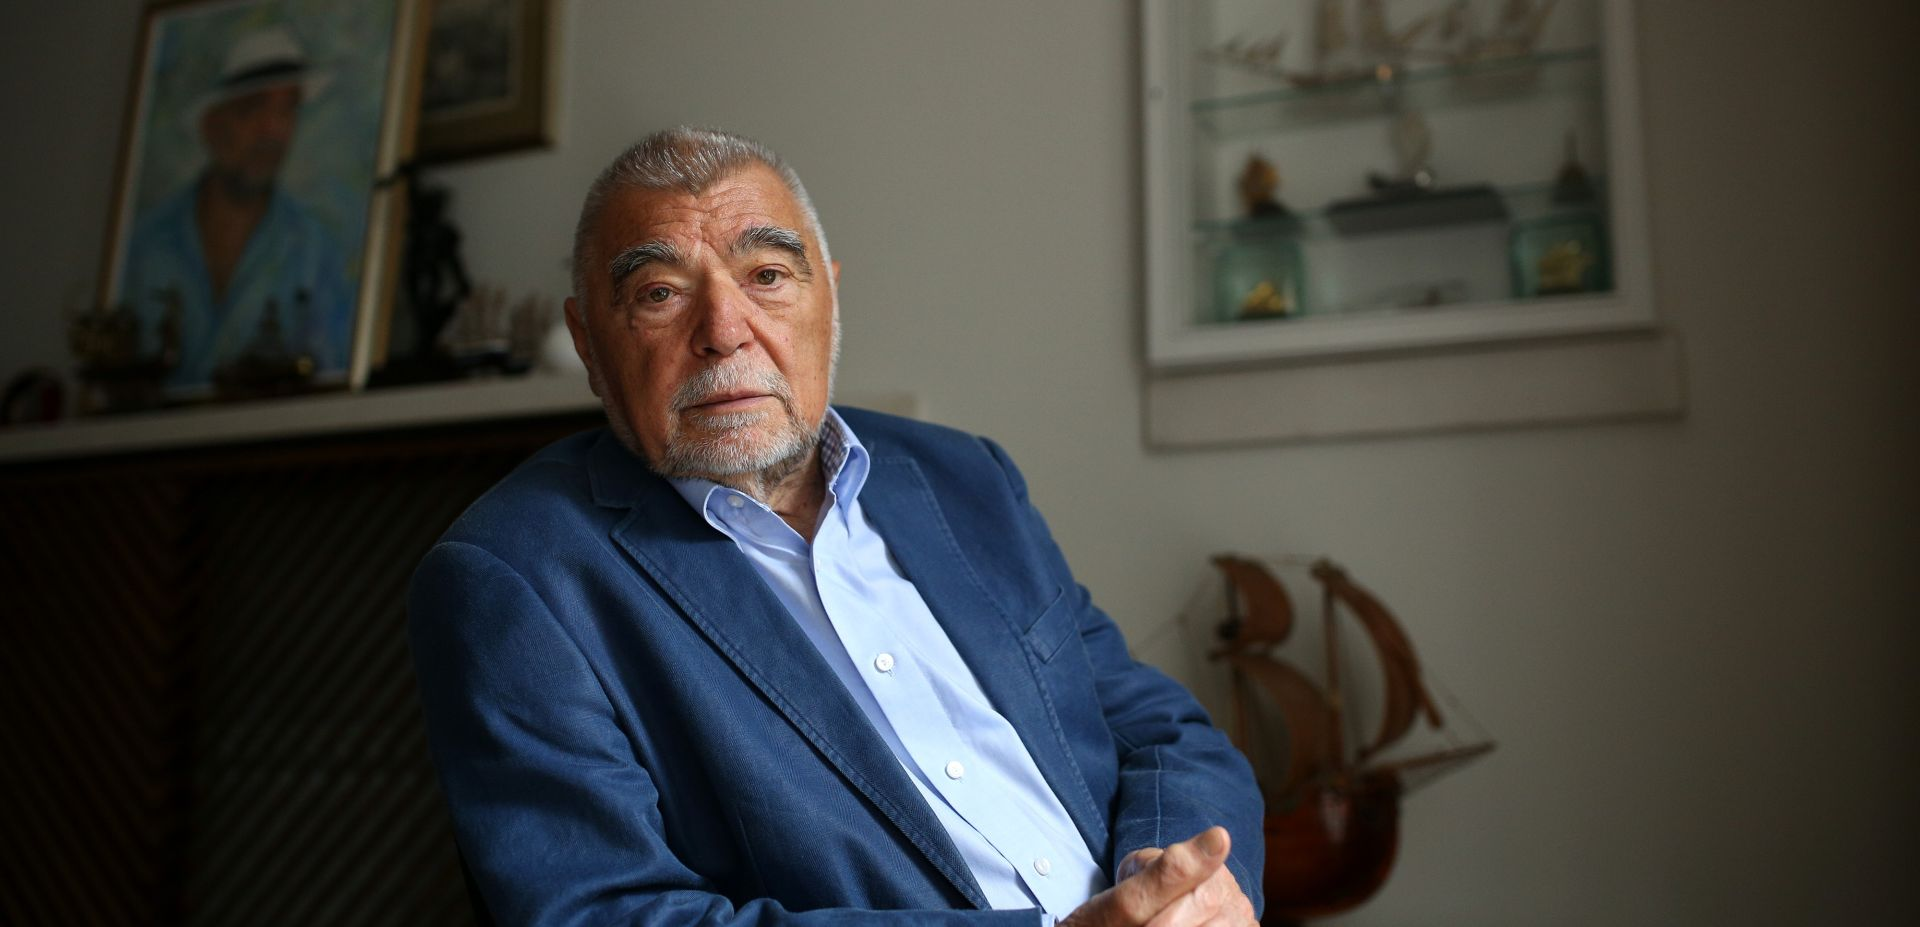 Stjepan Mesić odgovorio na prozivke oko Haaga